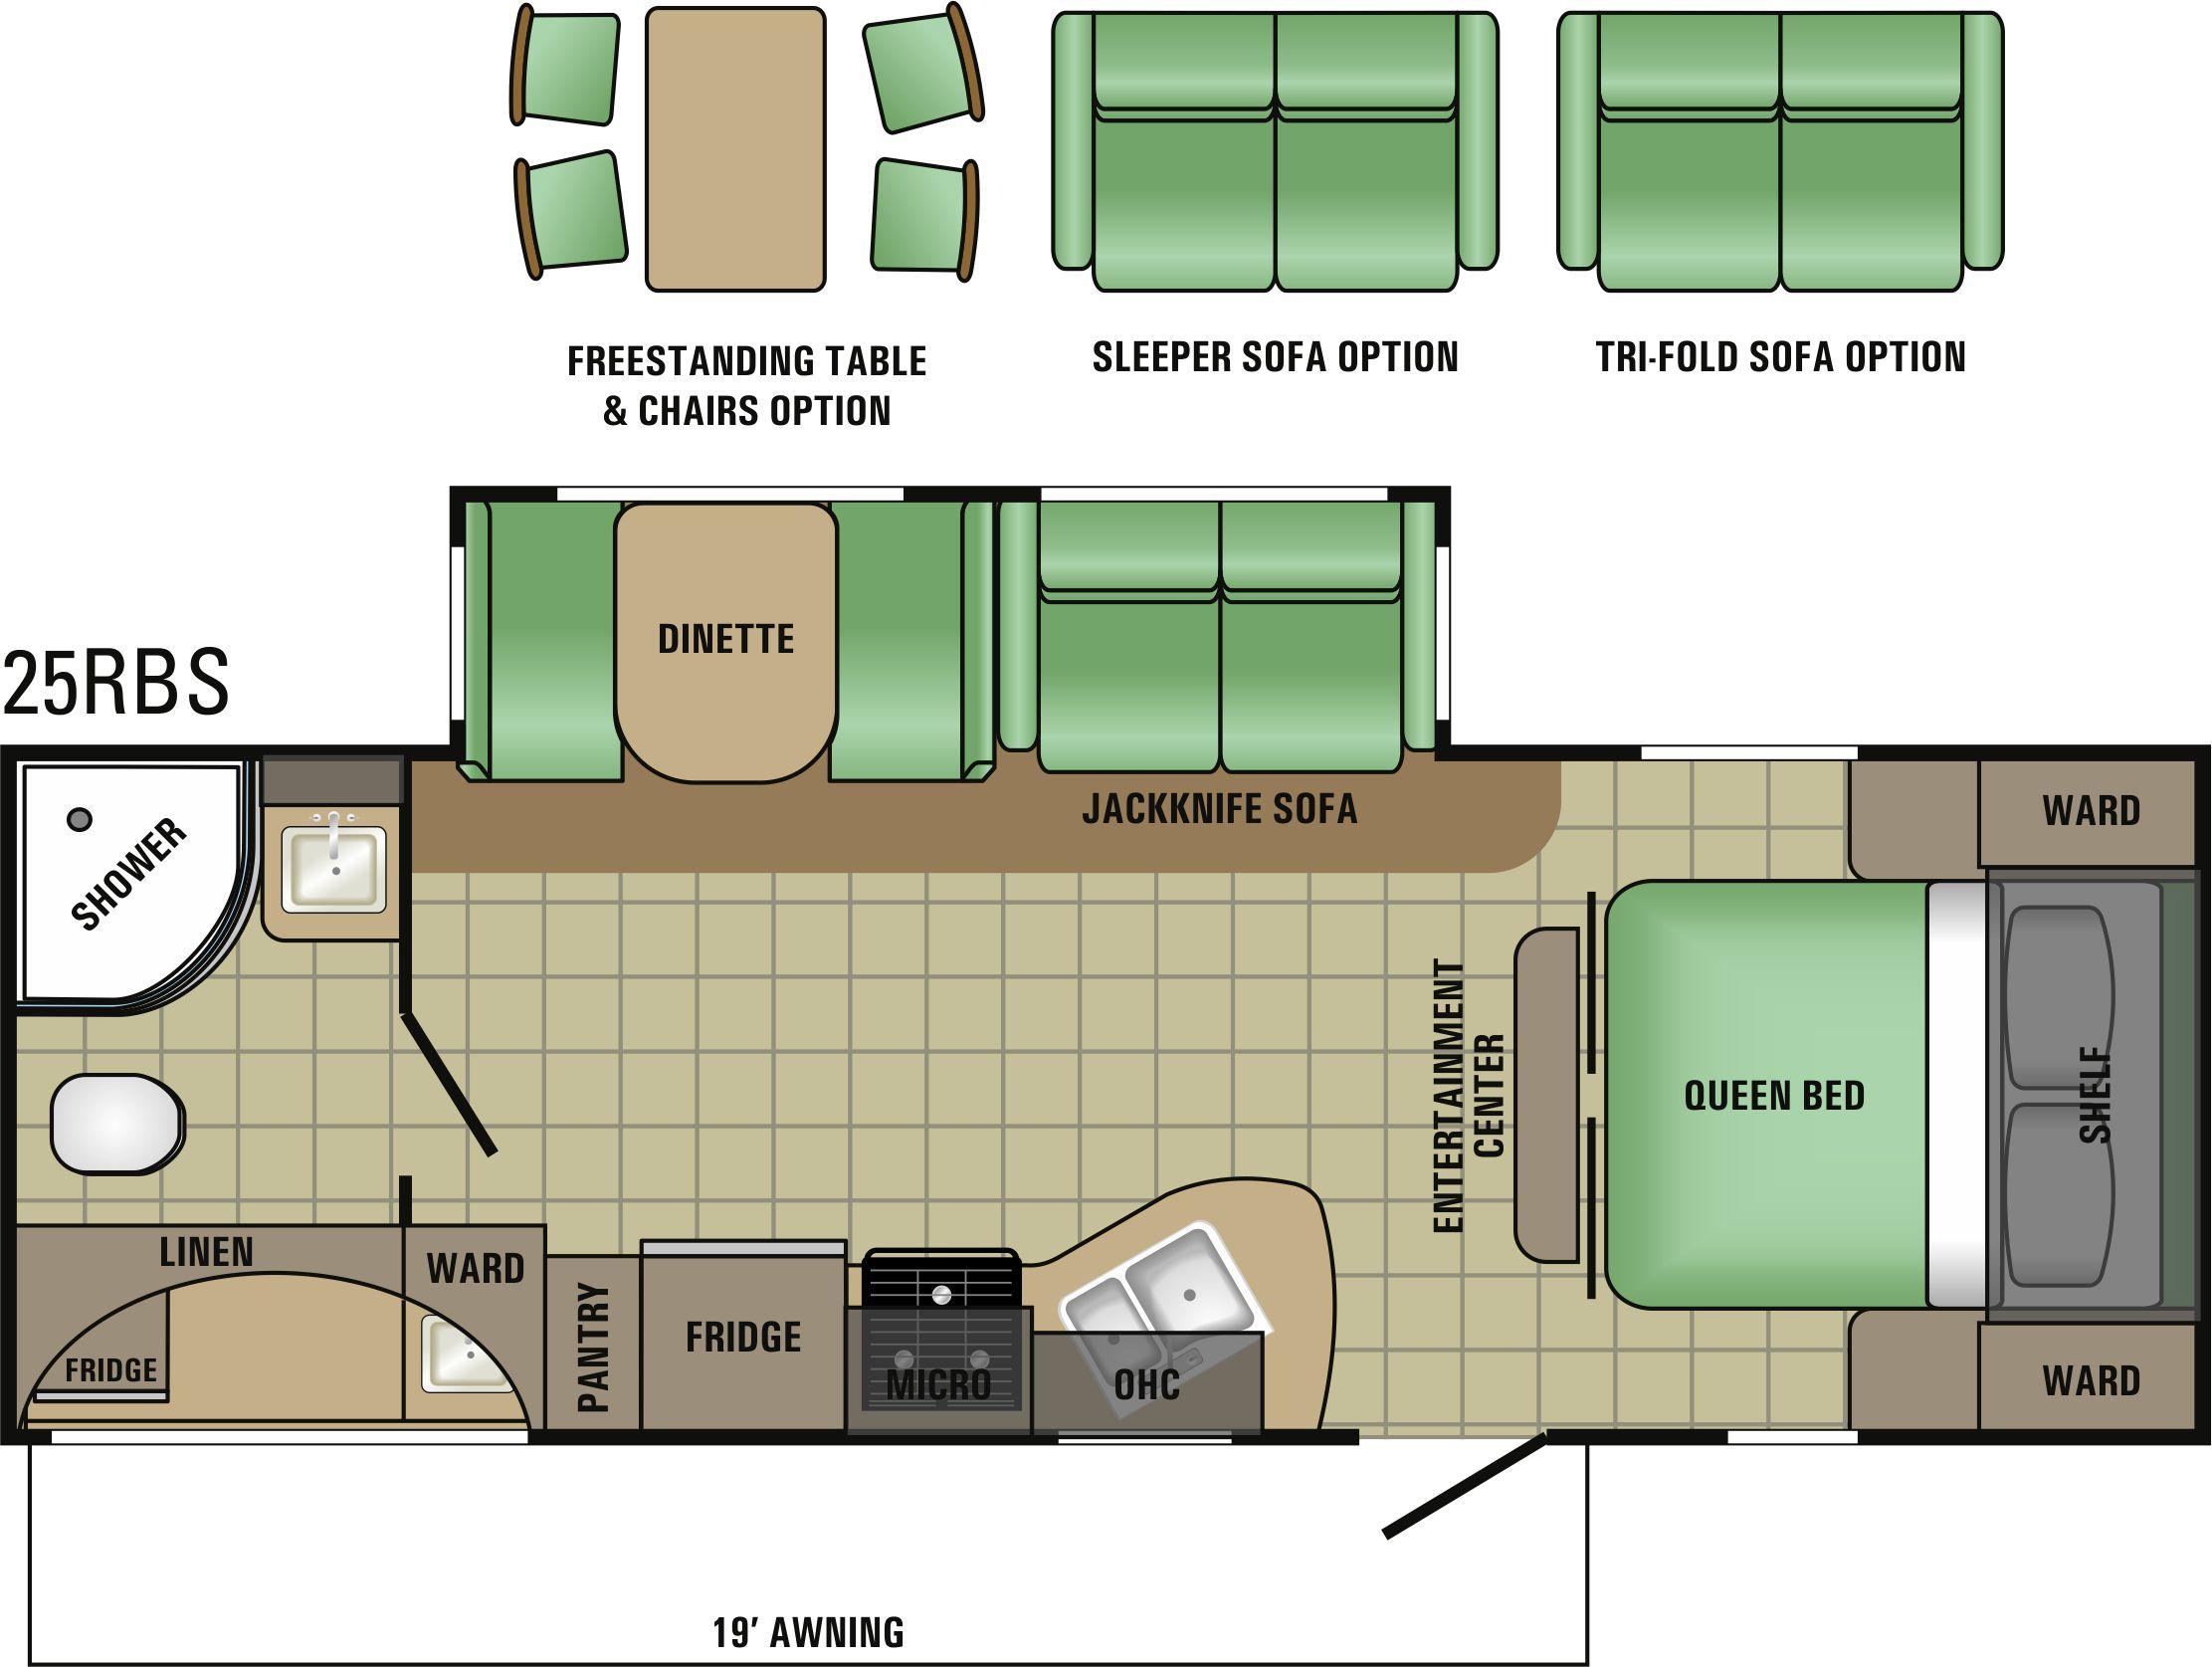 25RBS Floorplan